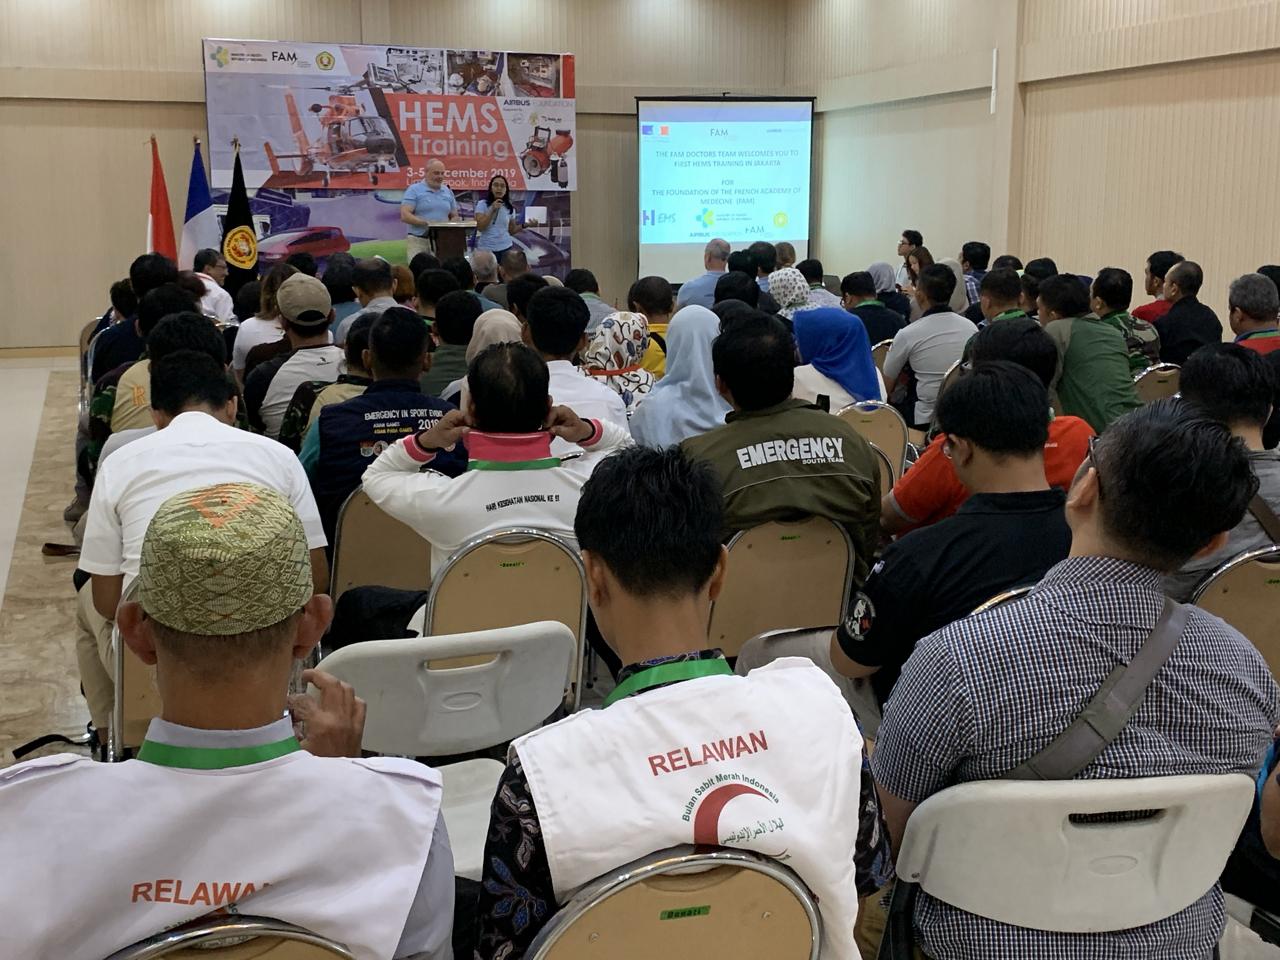 HEMS-training in Indonesia.